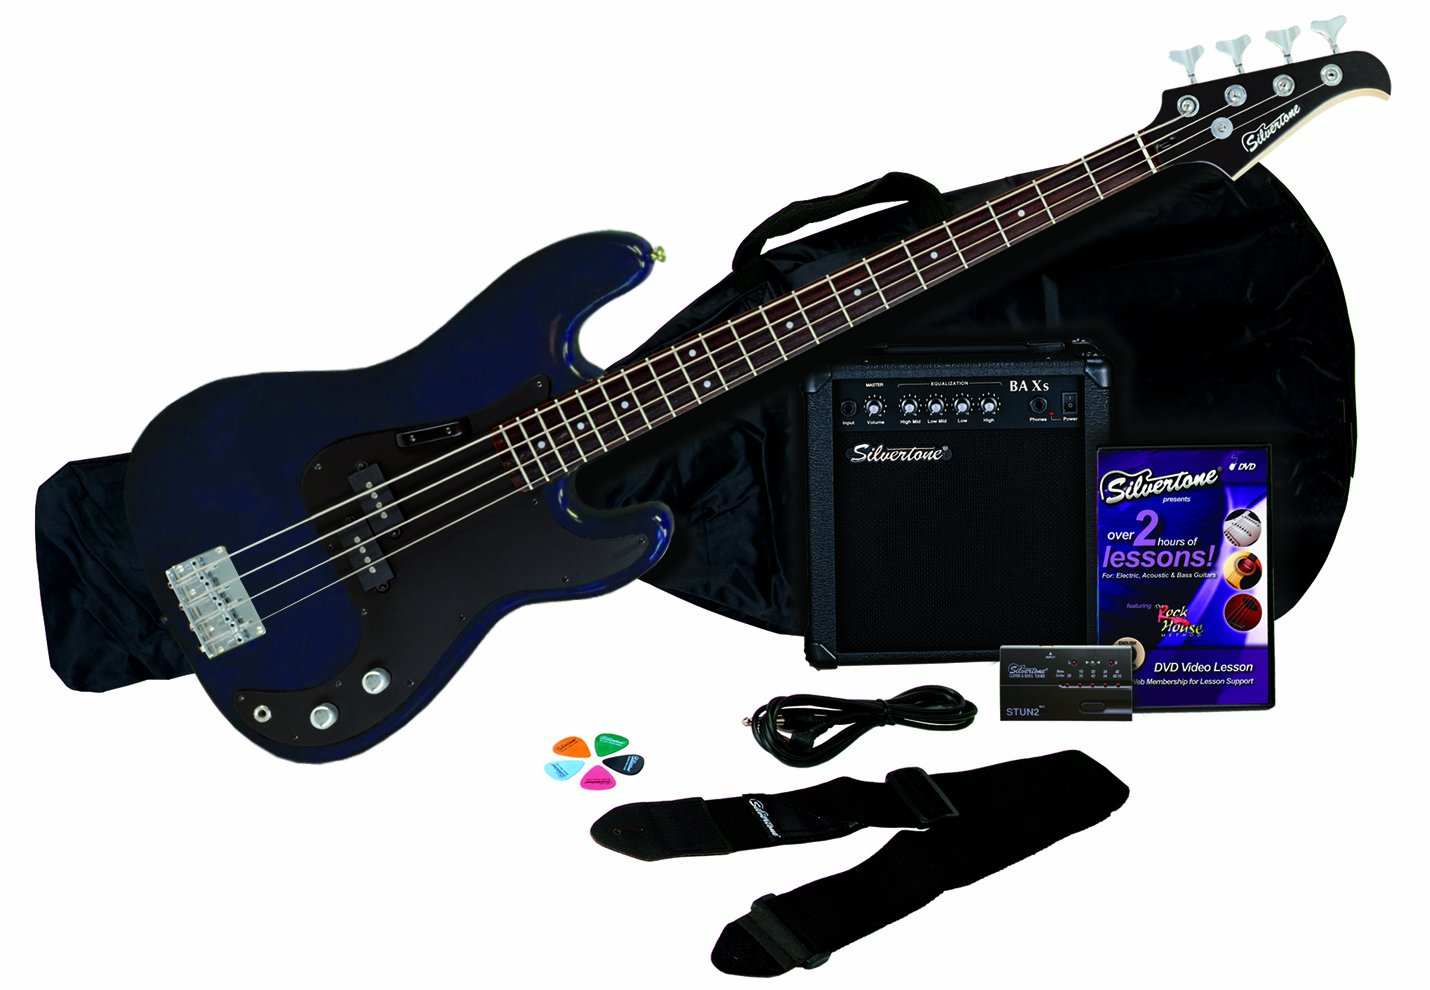 Silvertone LB11 Bass Guitar